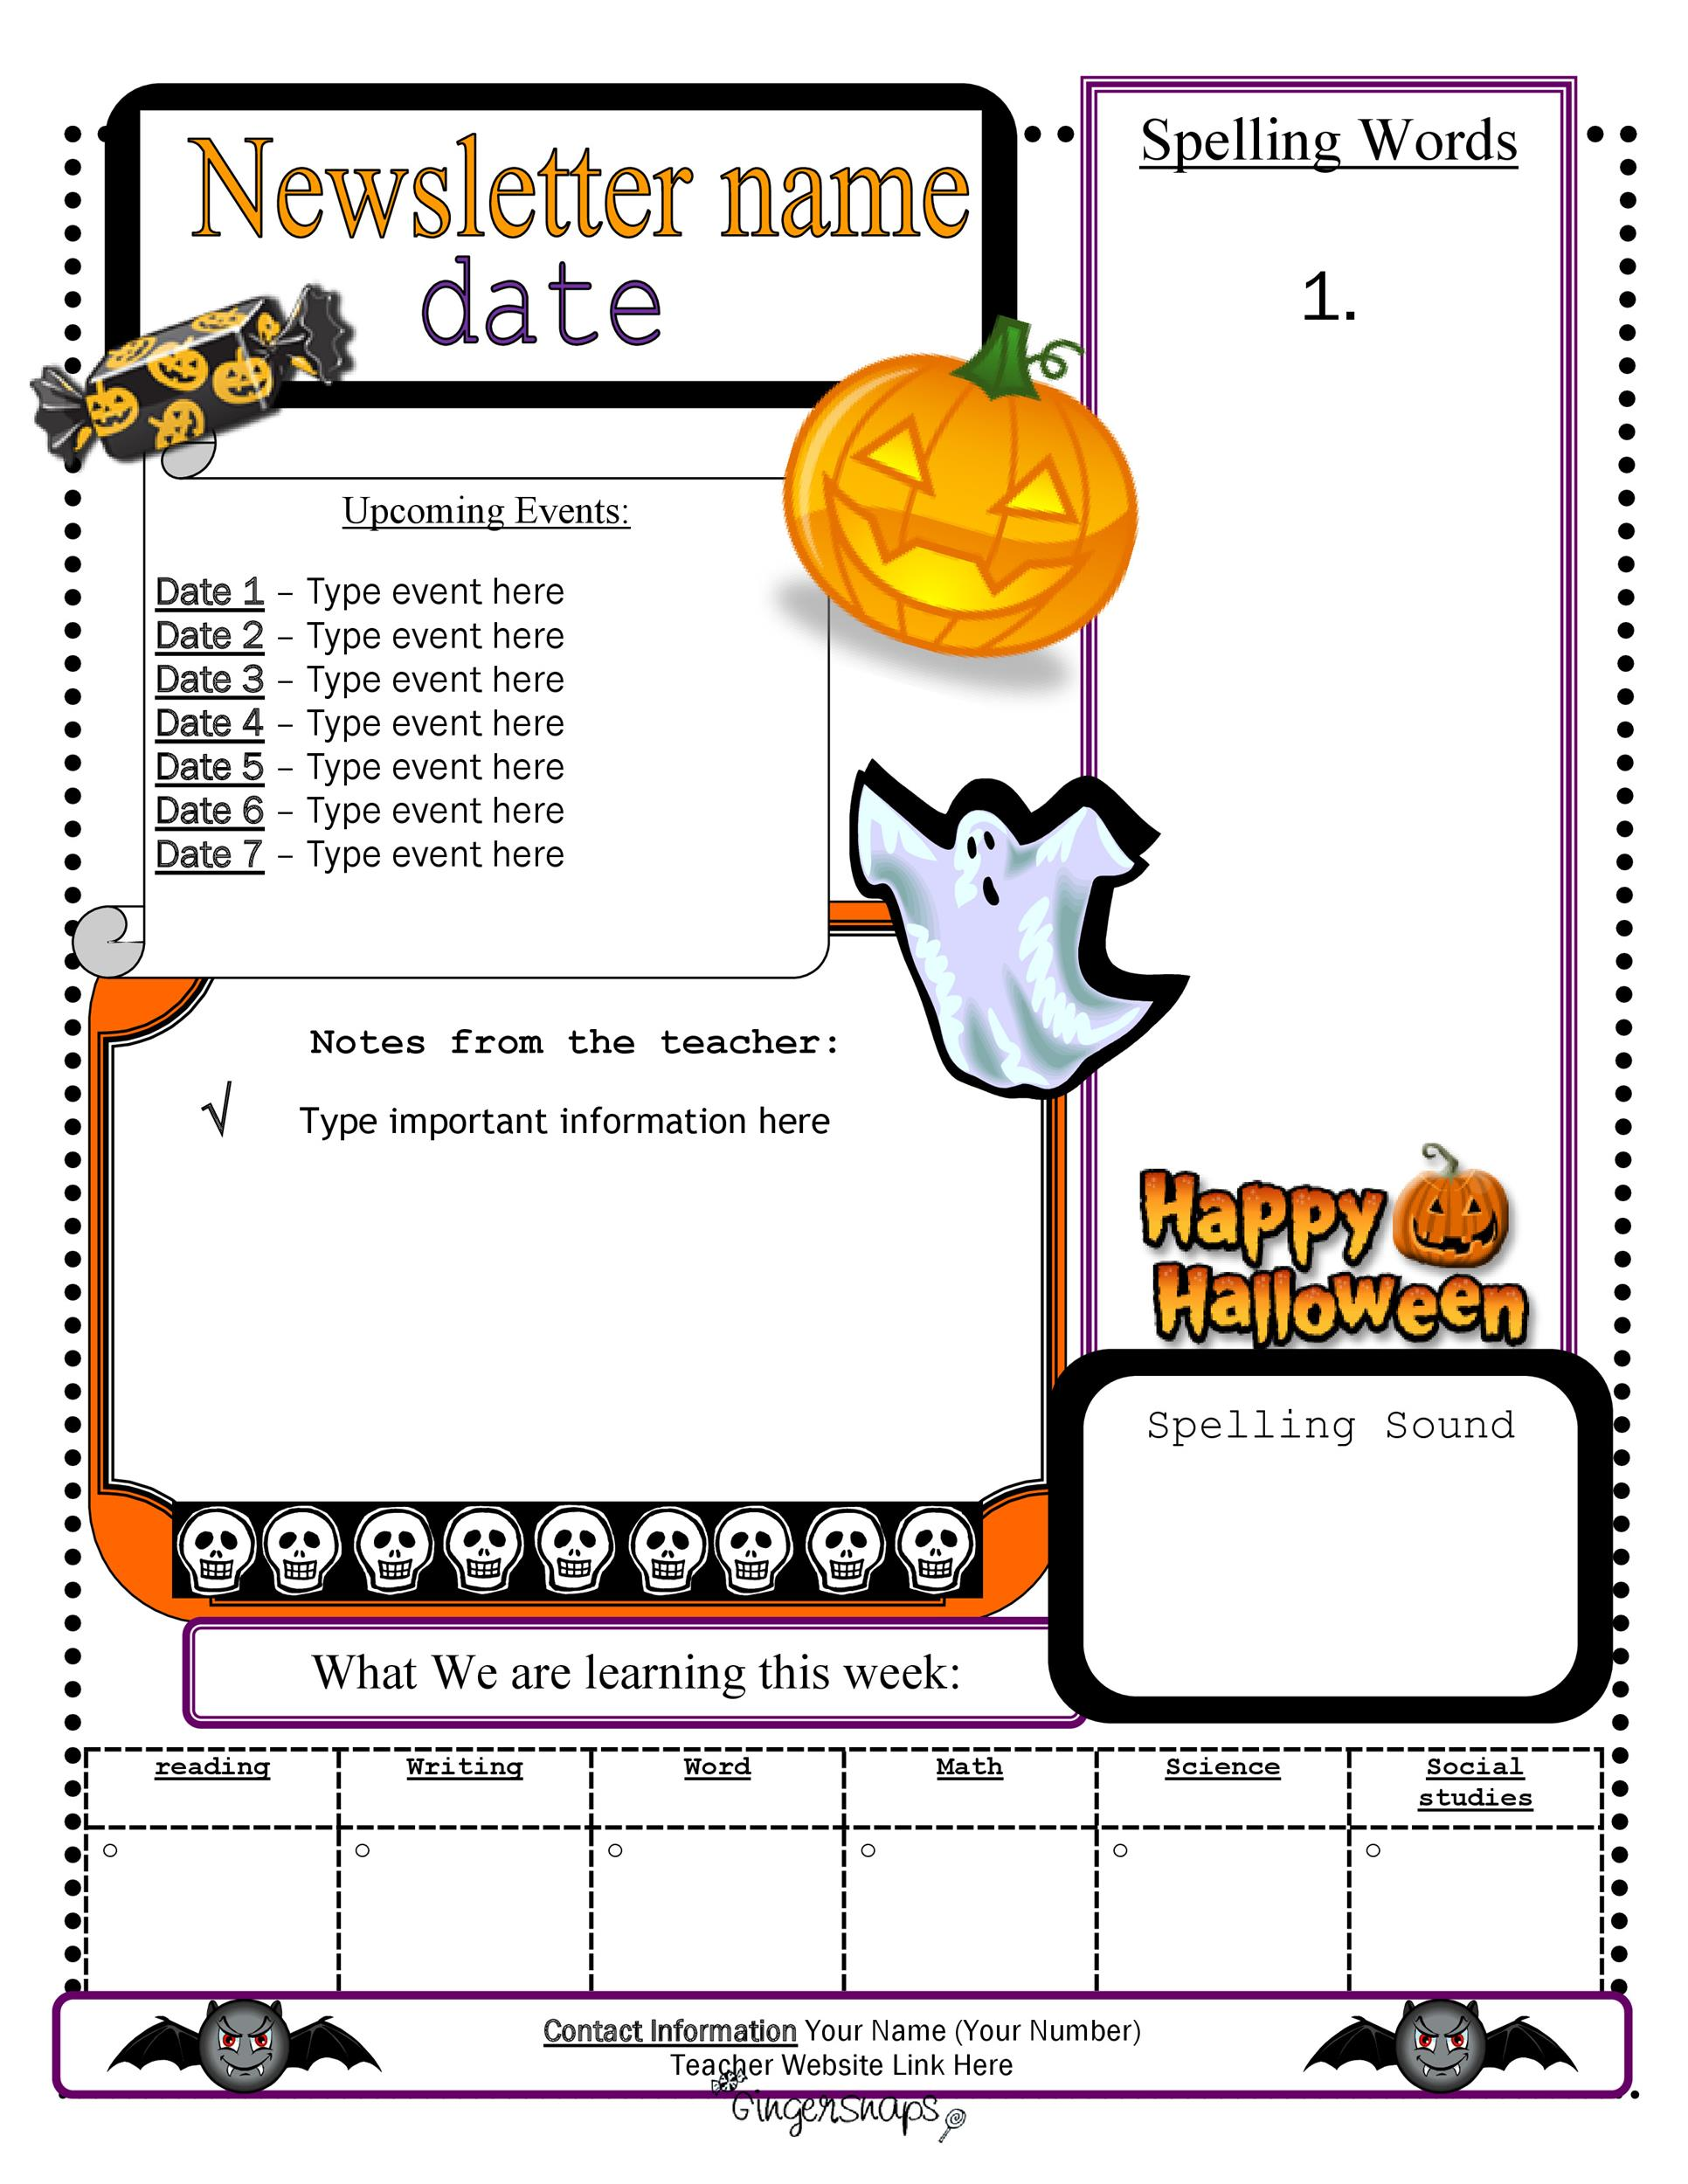 Free preschool newsletter template 20